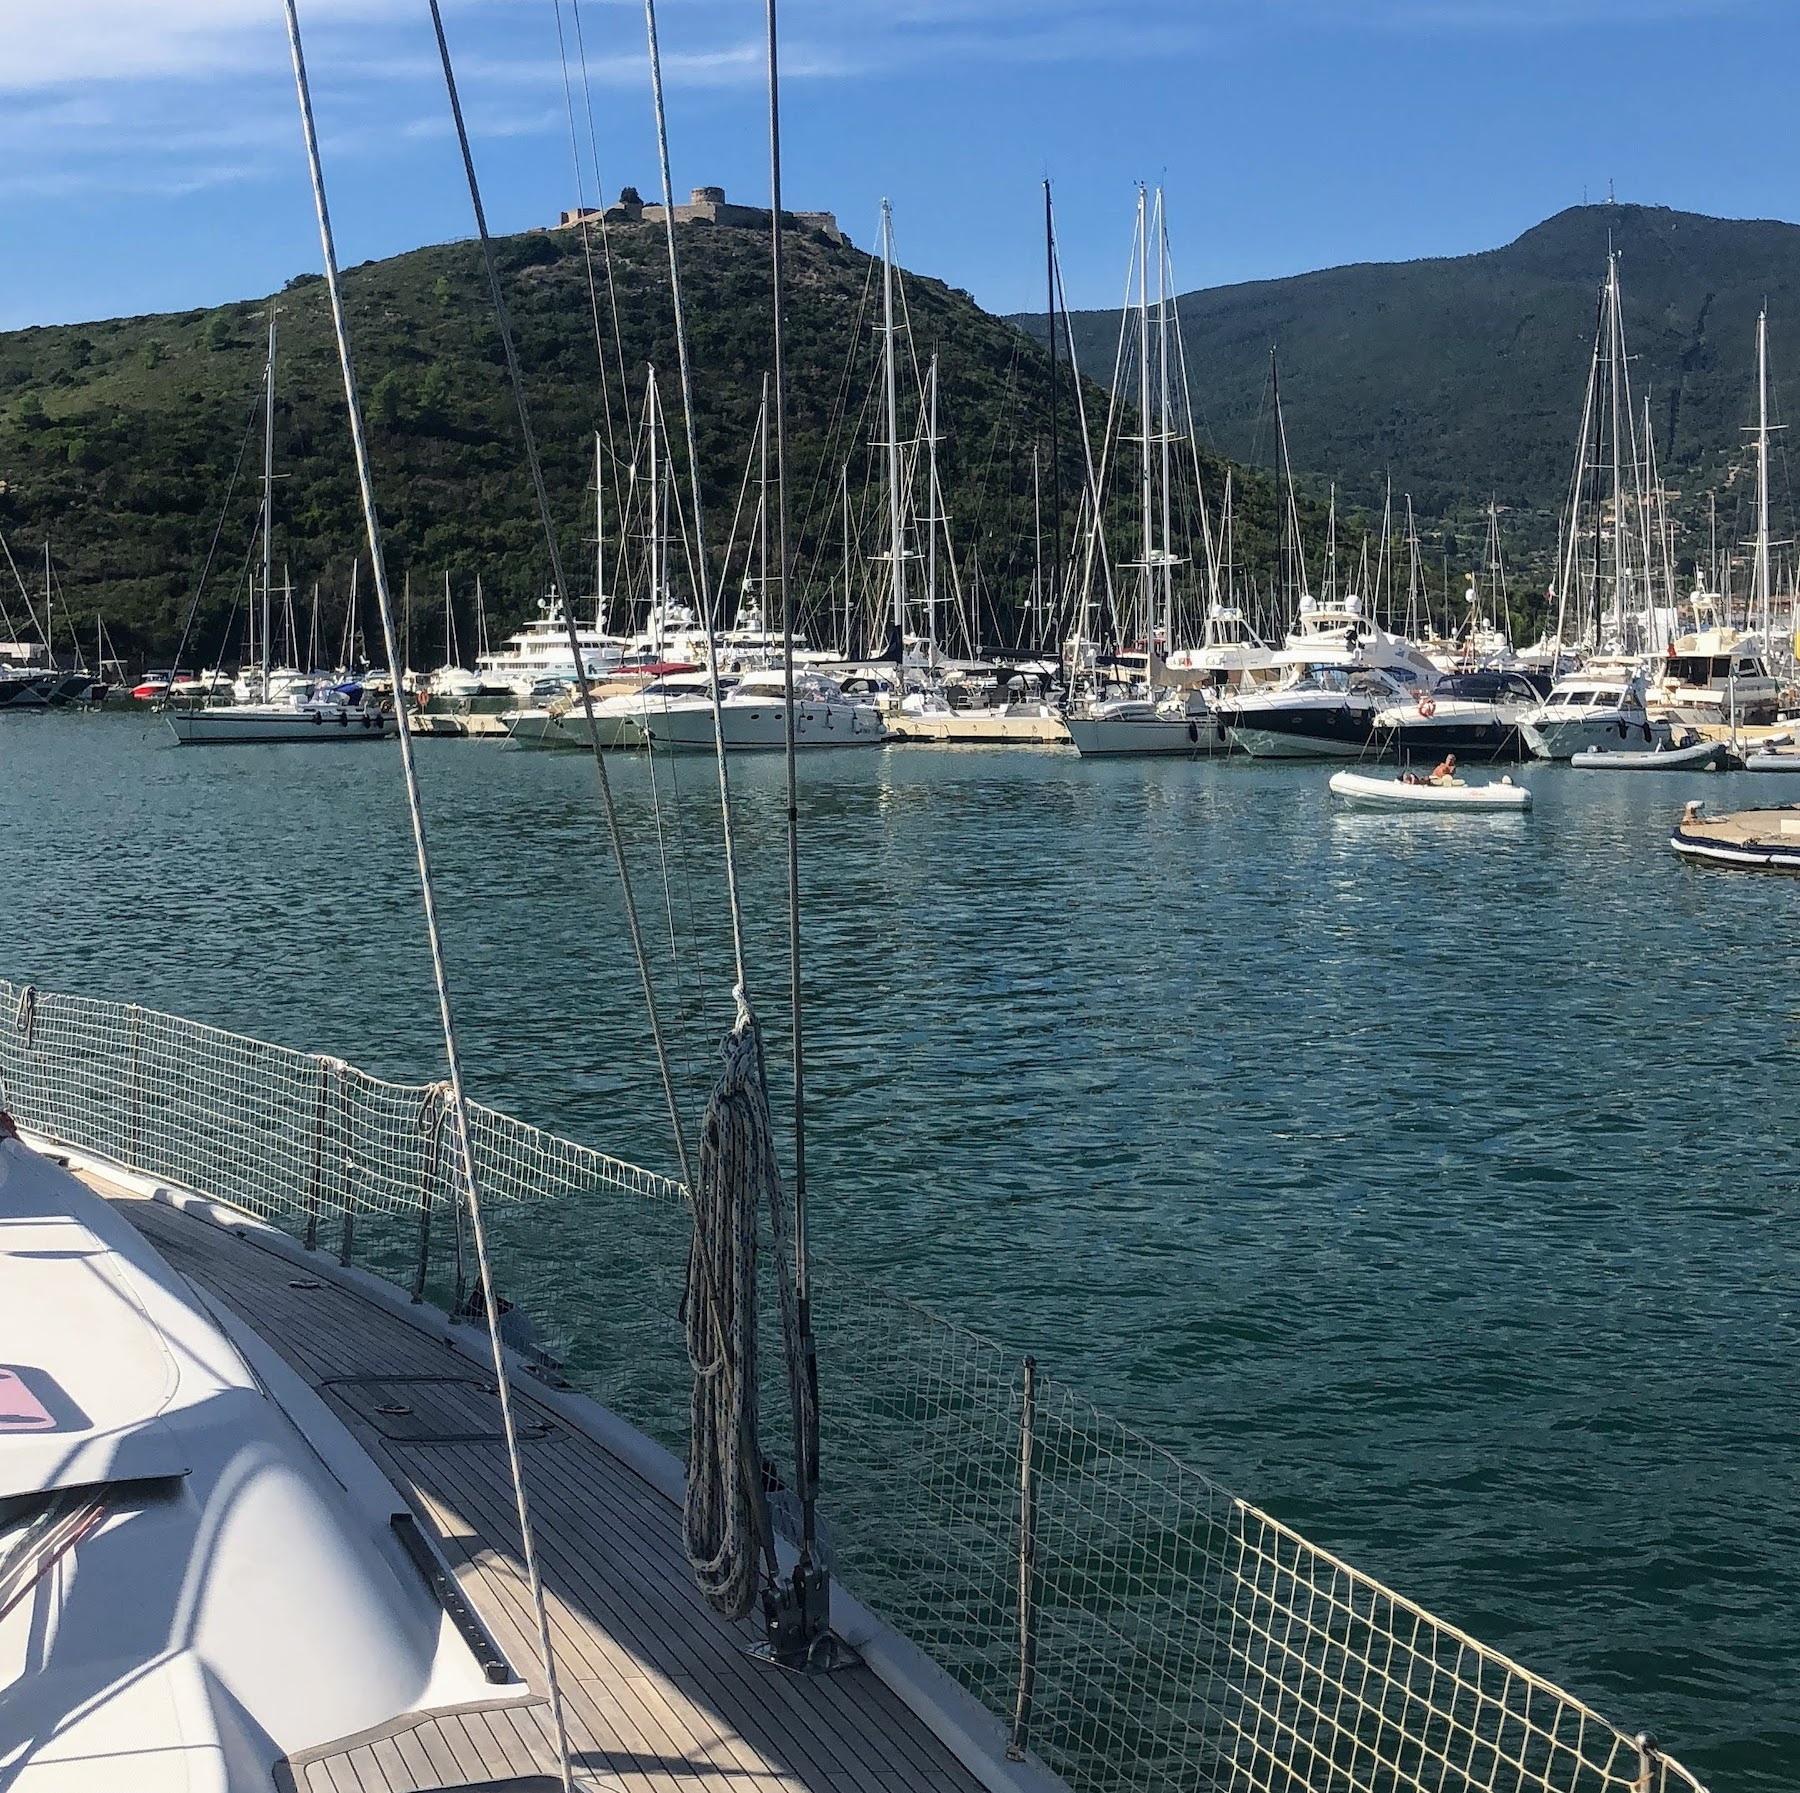 Марины Cala Galera и Porto Ercole